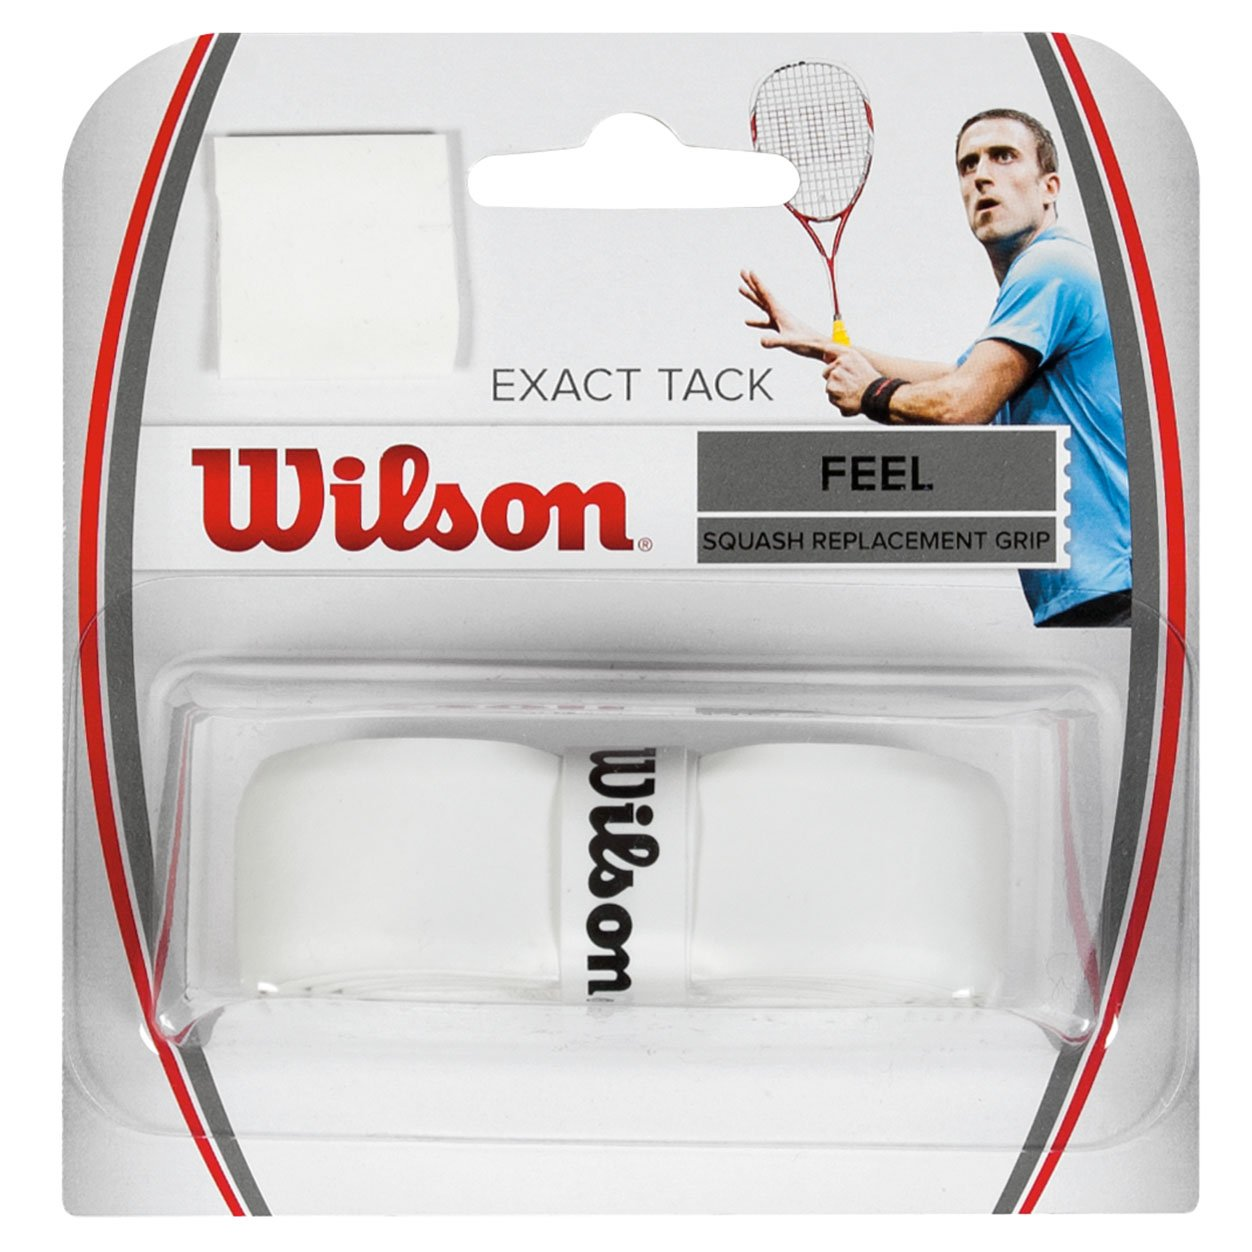 Wilson Exact Tack Squash Replacement Grip Stück 1Unit